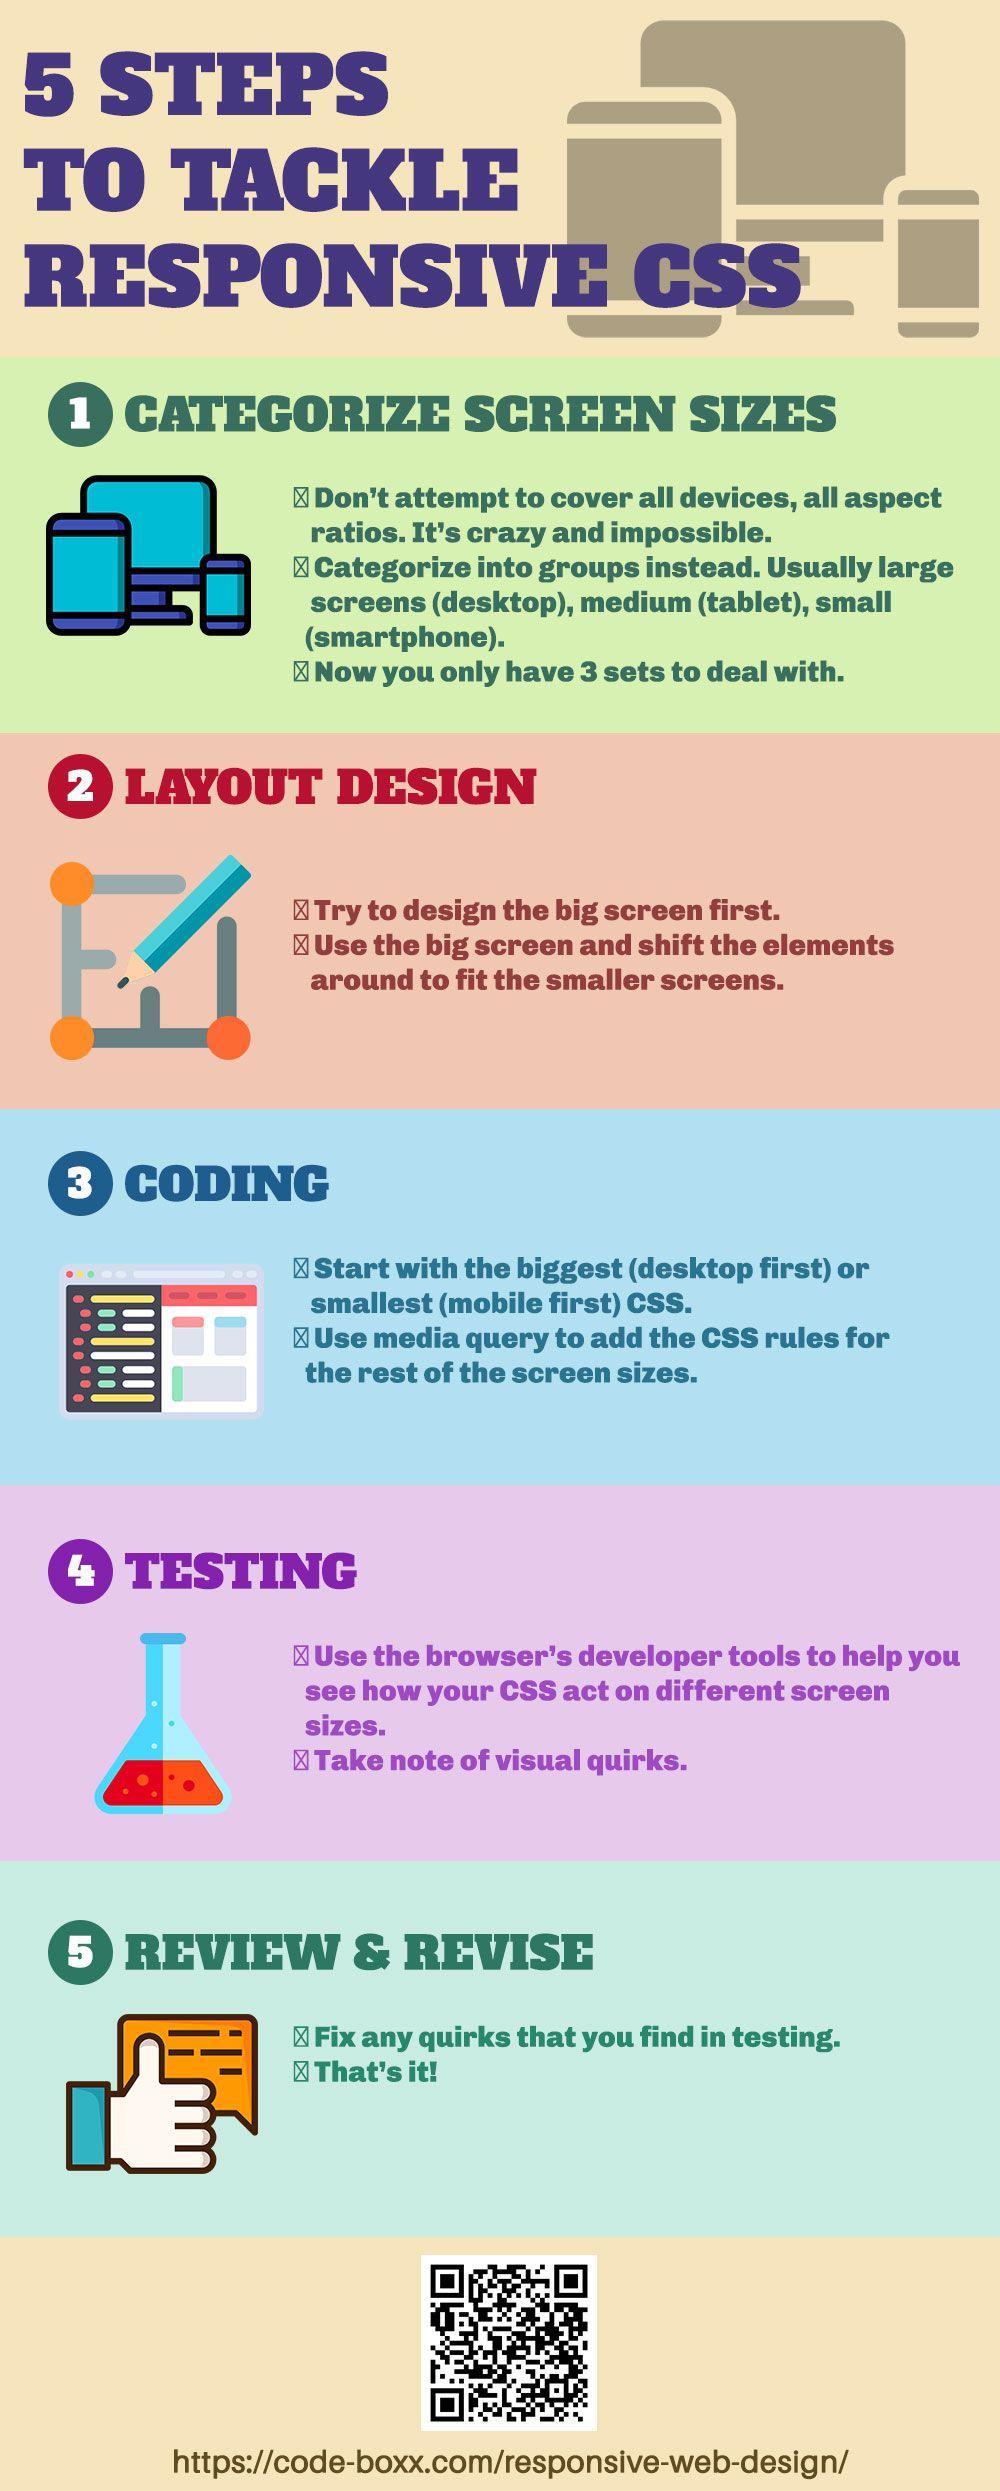 How To Tackle Responsive Css Design Css Html Webdeveloper Coding Programming Beginner Web Design Marketing Web Design Programs Web Design